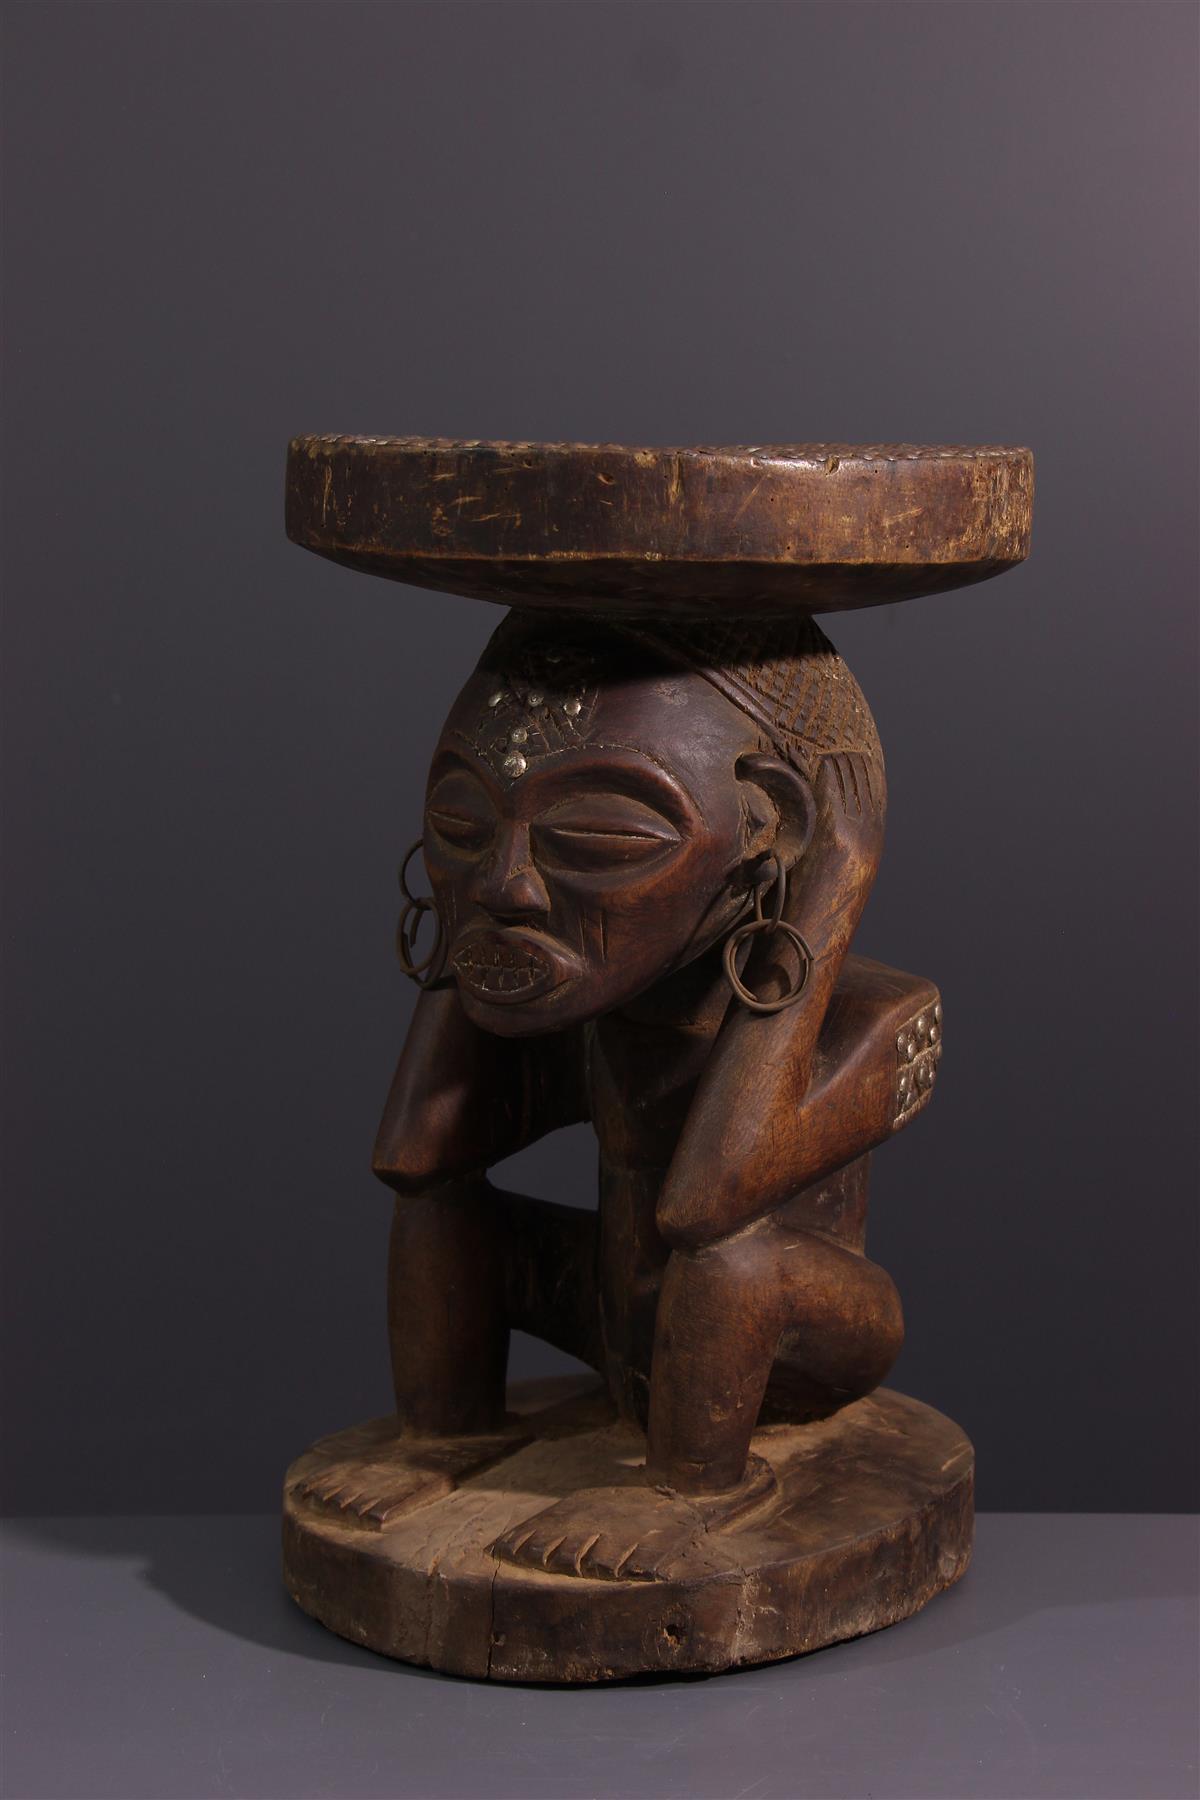 Tschokwe seat - African art